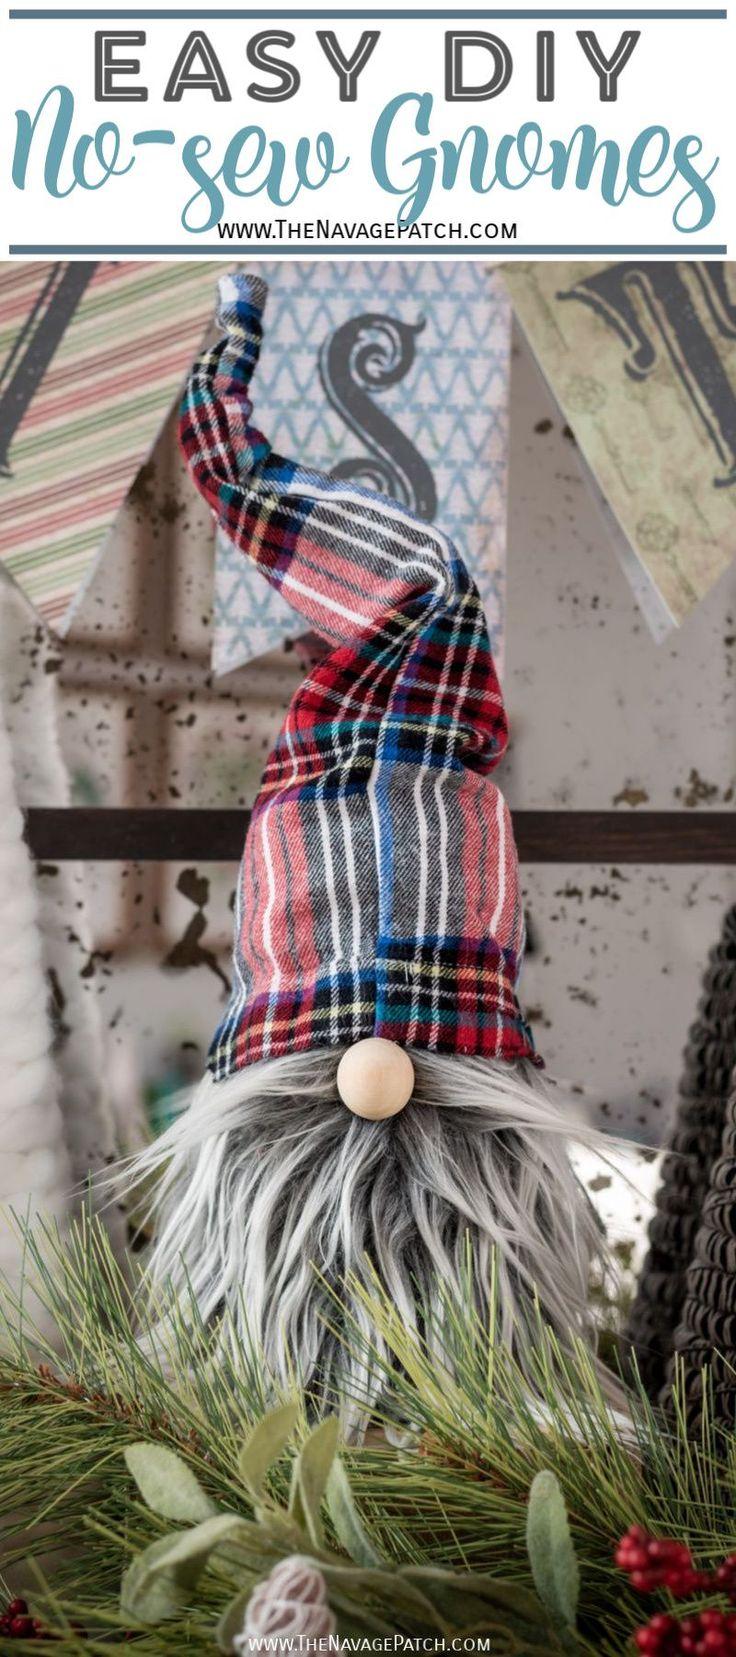 Easy DIY Christmas Gnomes in 2020 Easy christmas diy